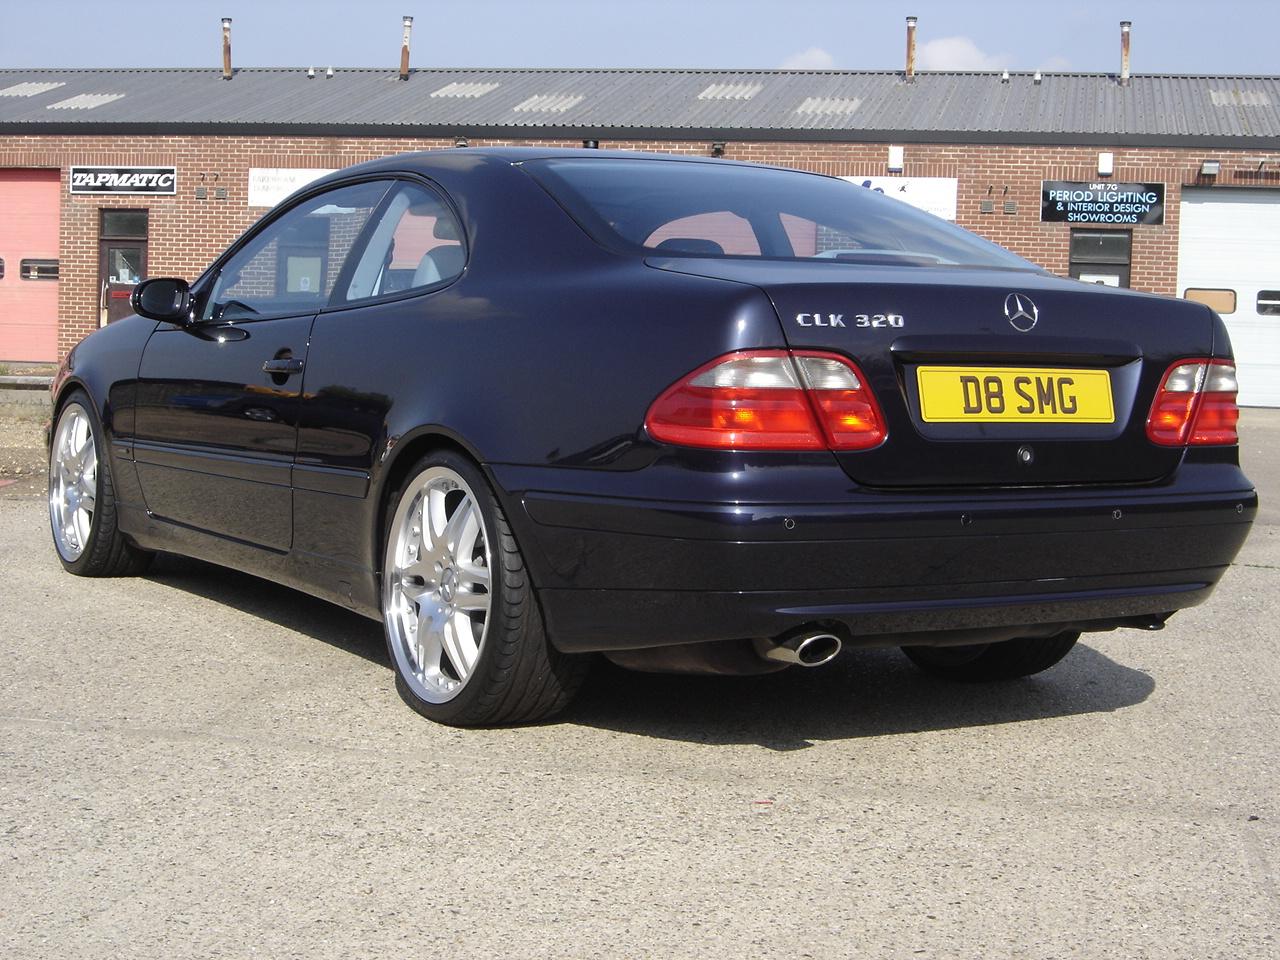 2001 mercedes benz clk320 coupe for Mercedes benz clk320